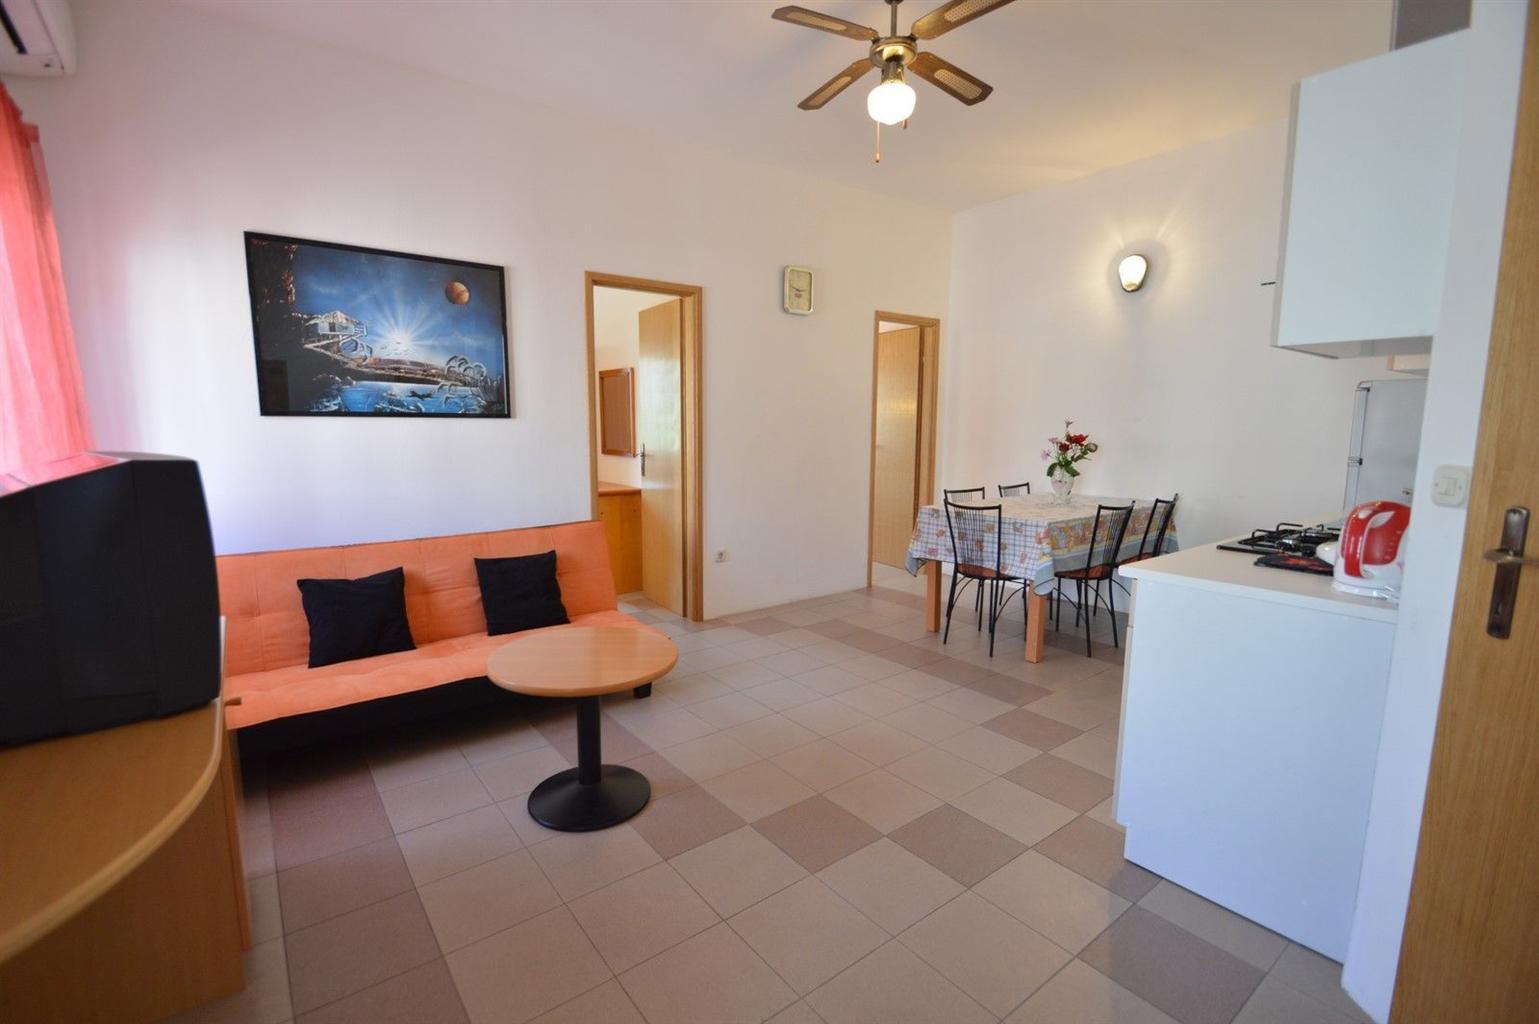 Ferienwohnung Ferienwohnungen GOGA 23531-A3 (2021392), Mali Lošinj, Insel Losinj, Kvarner, Kroatien, Bild 9